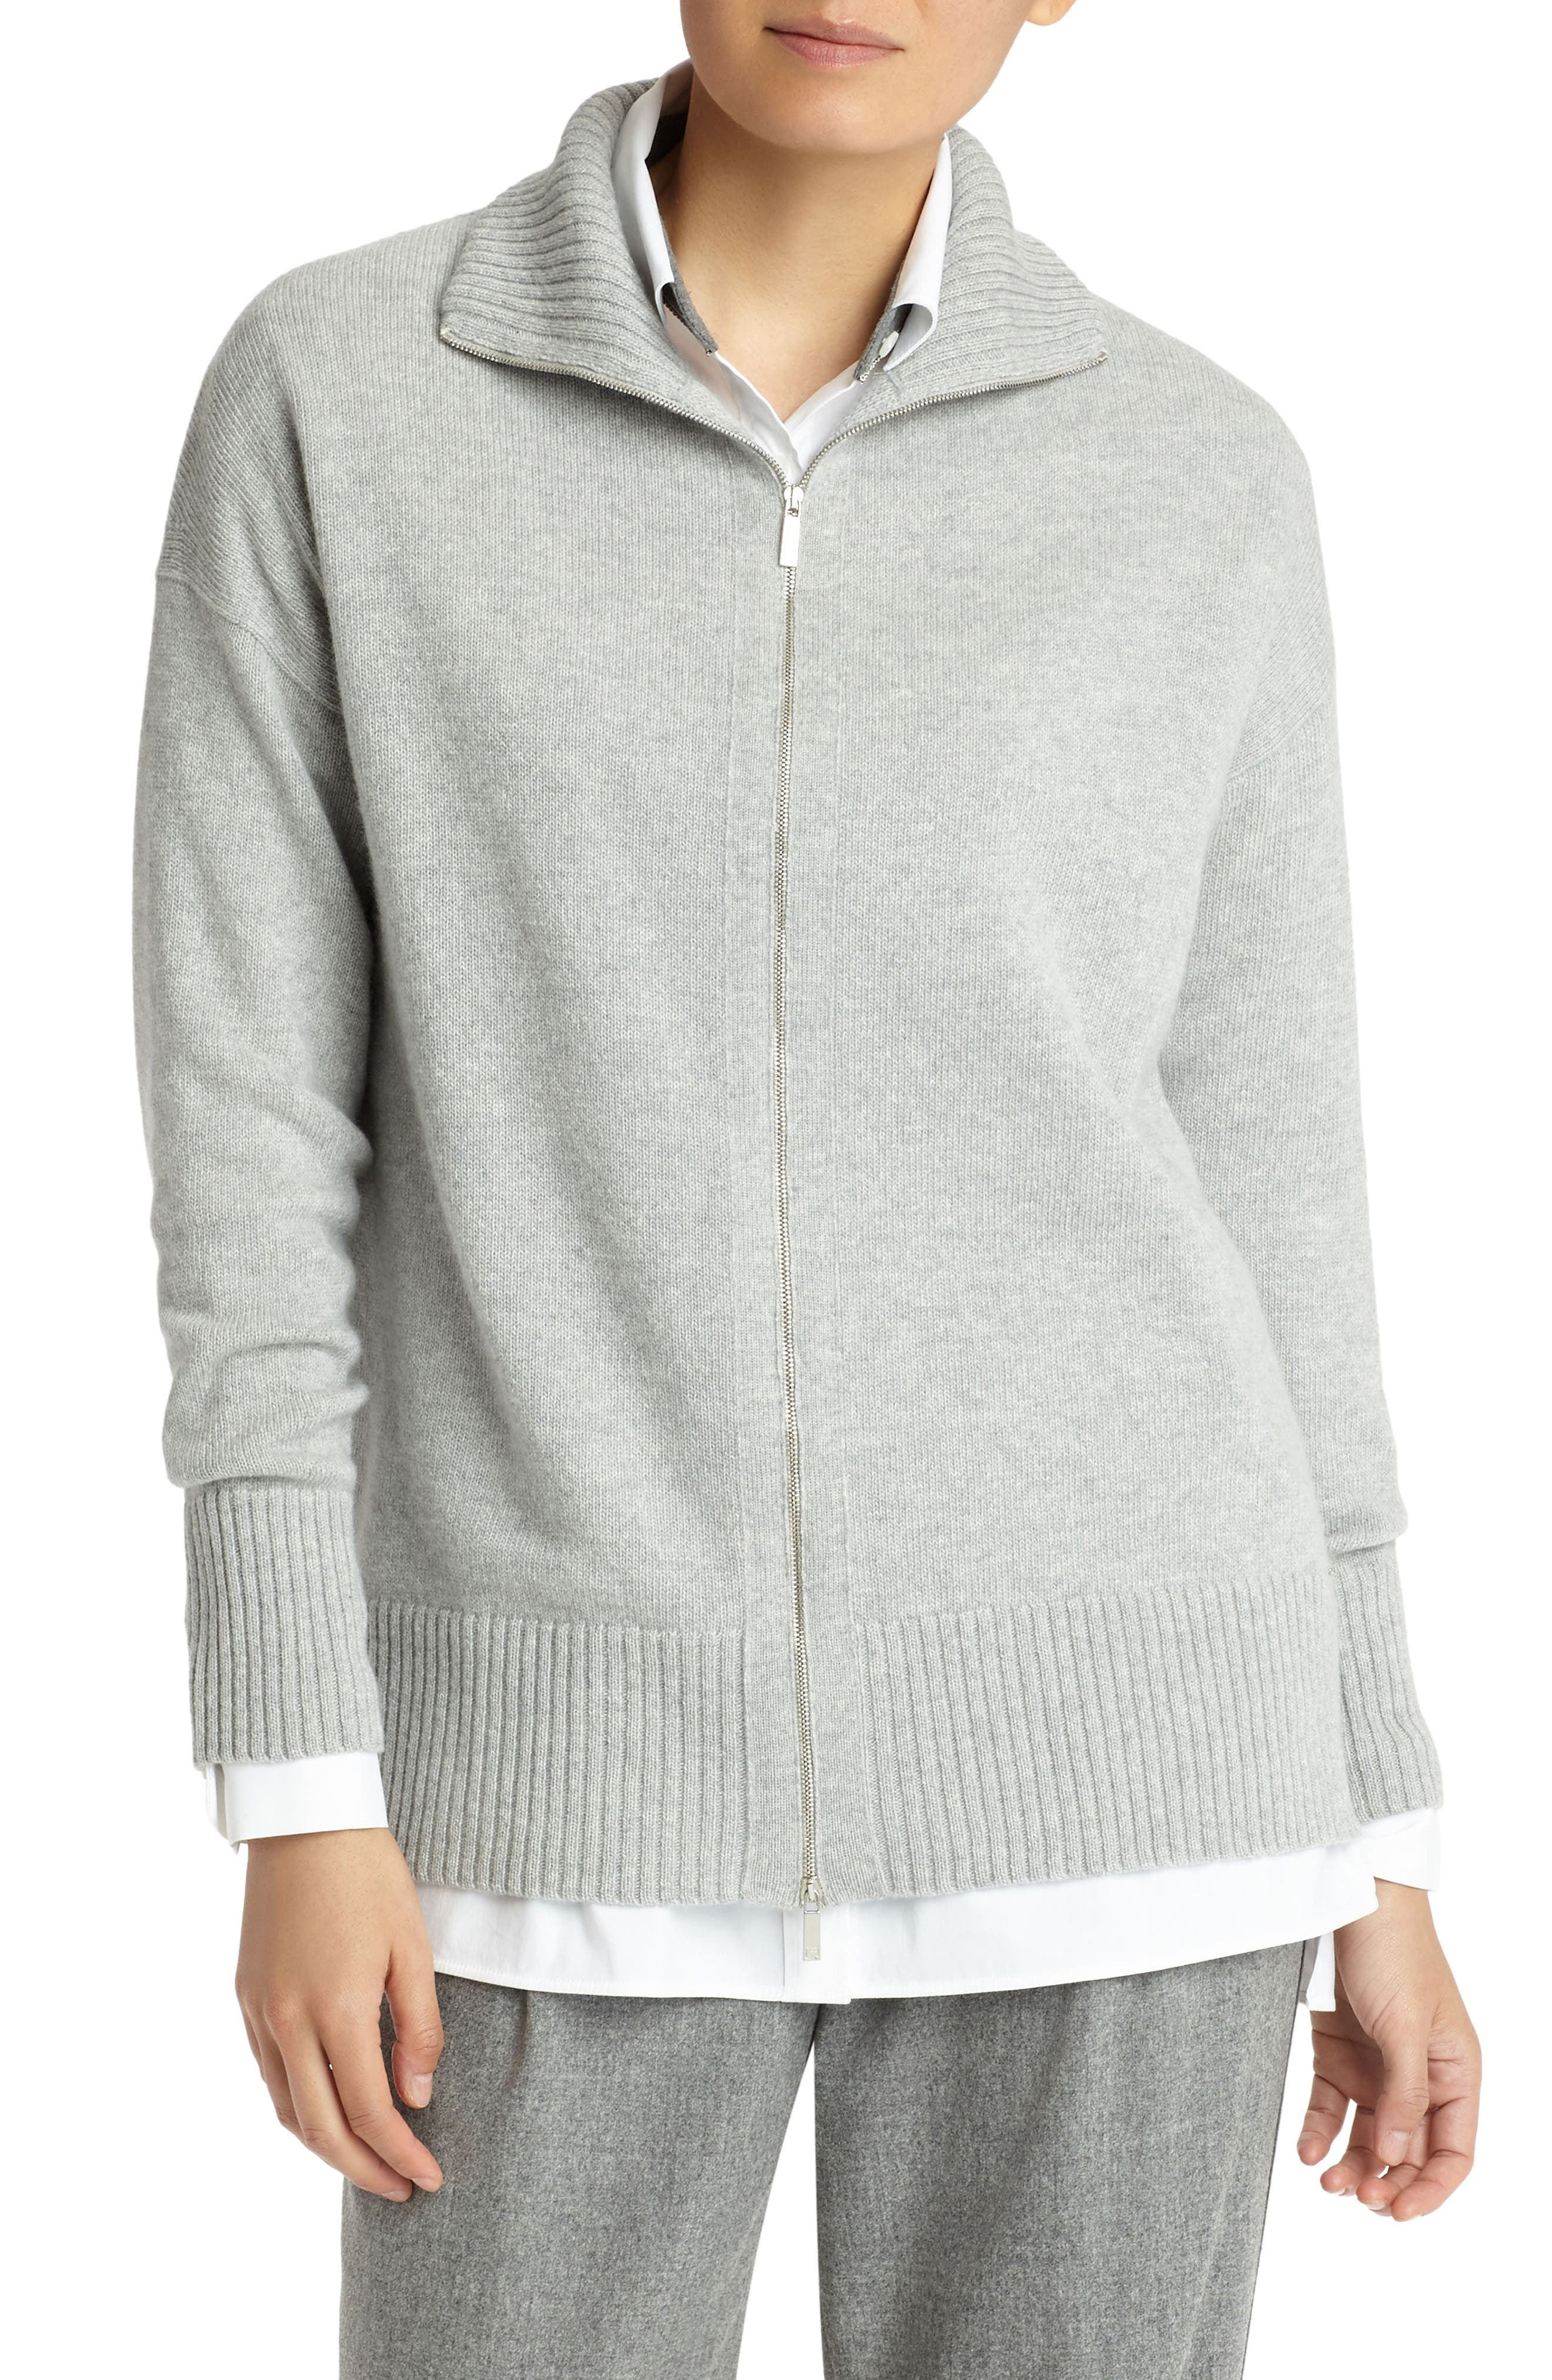 Main Image - Lafayette 148 New York Luxe Merino Wool & Cashmere Sweater Jacket